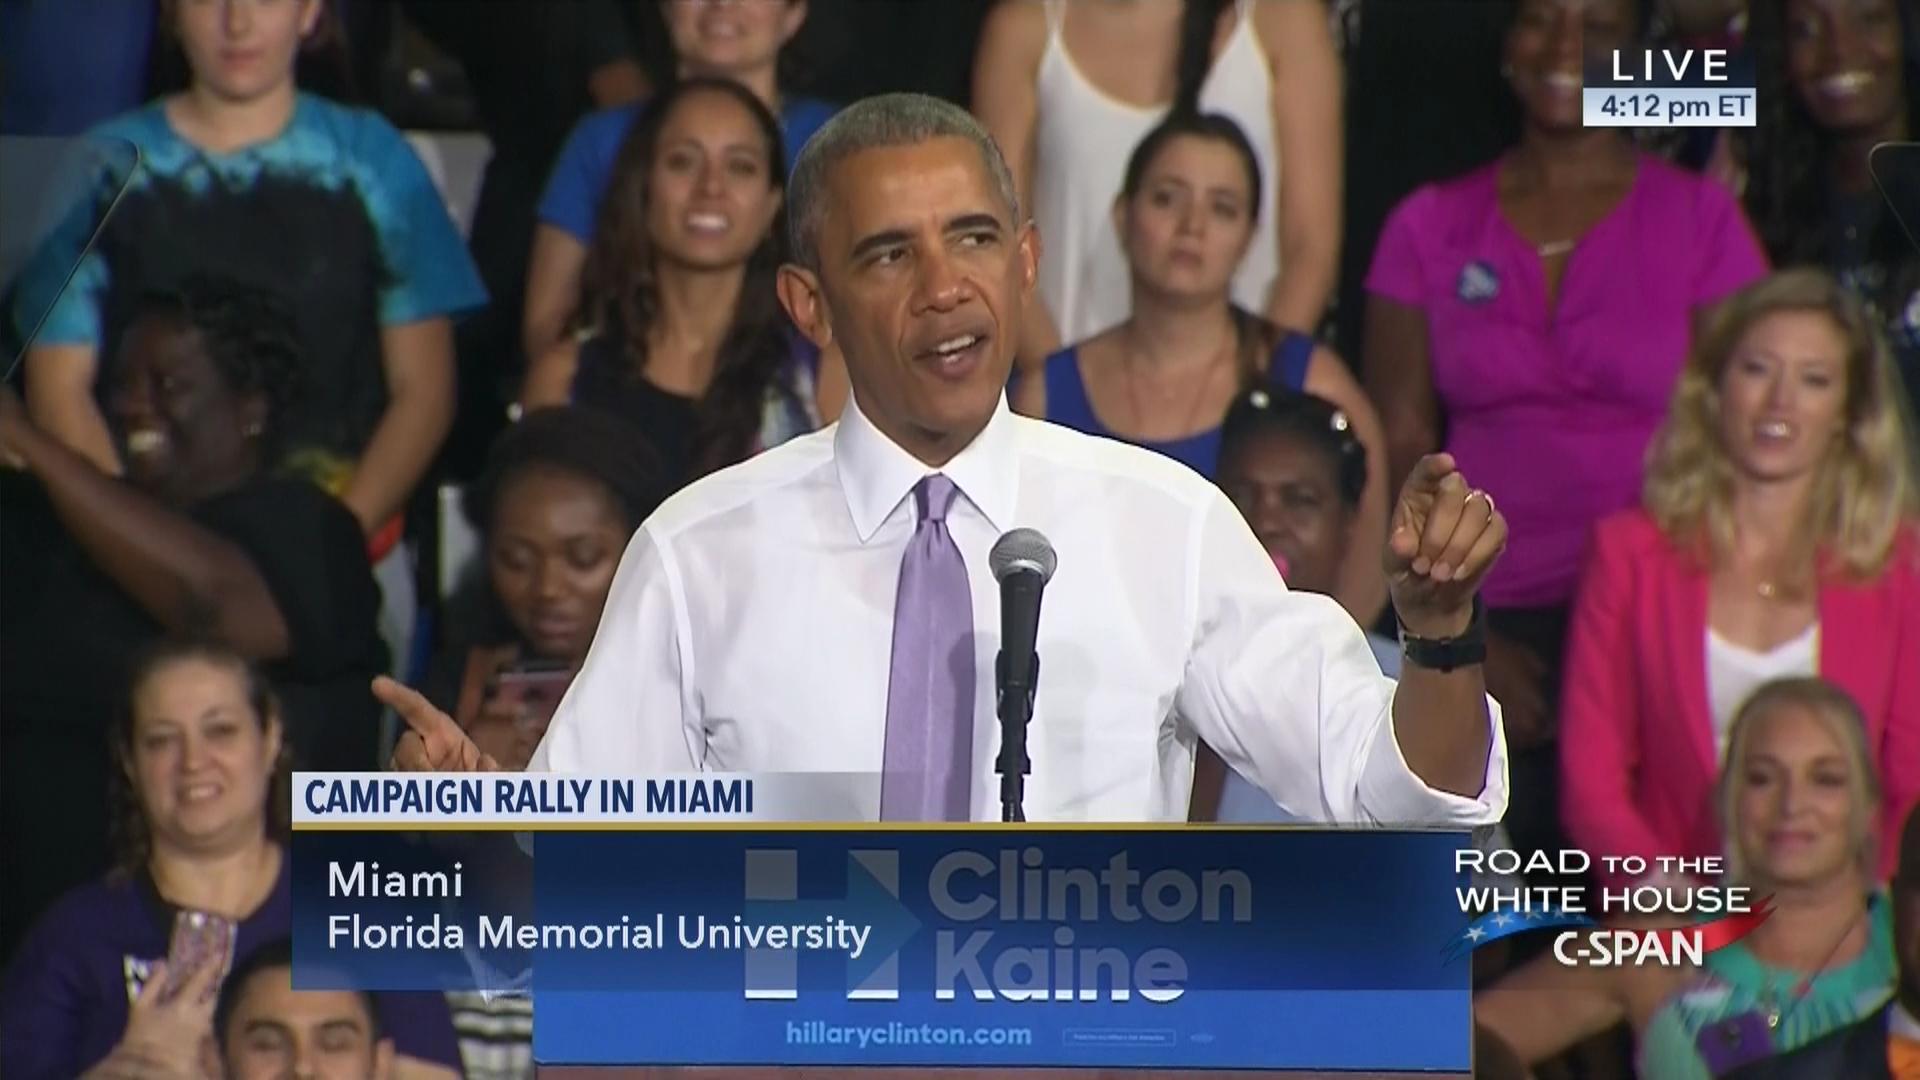 President Obama Campaigns Hillary Clinton Miami Florida Oct 20 2016 – Planned Parenthood Miami Gardens